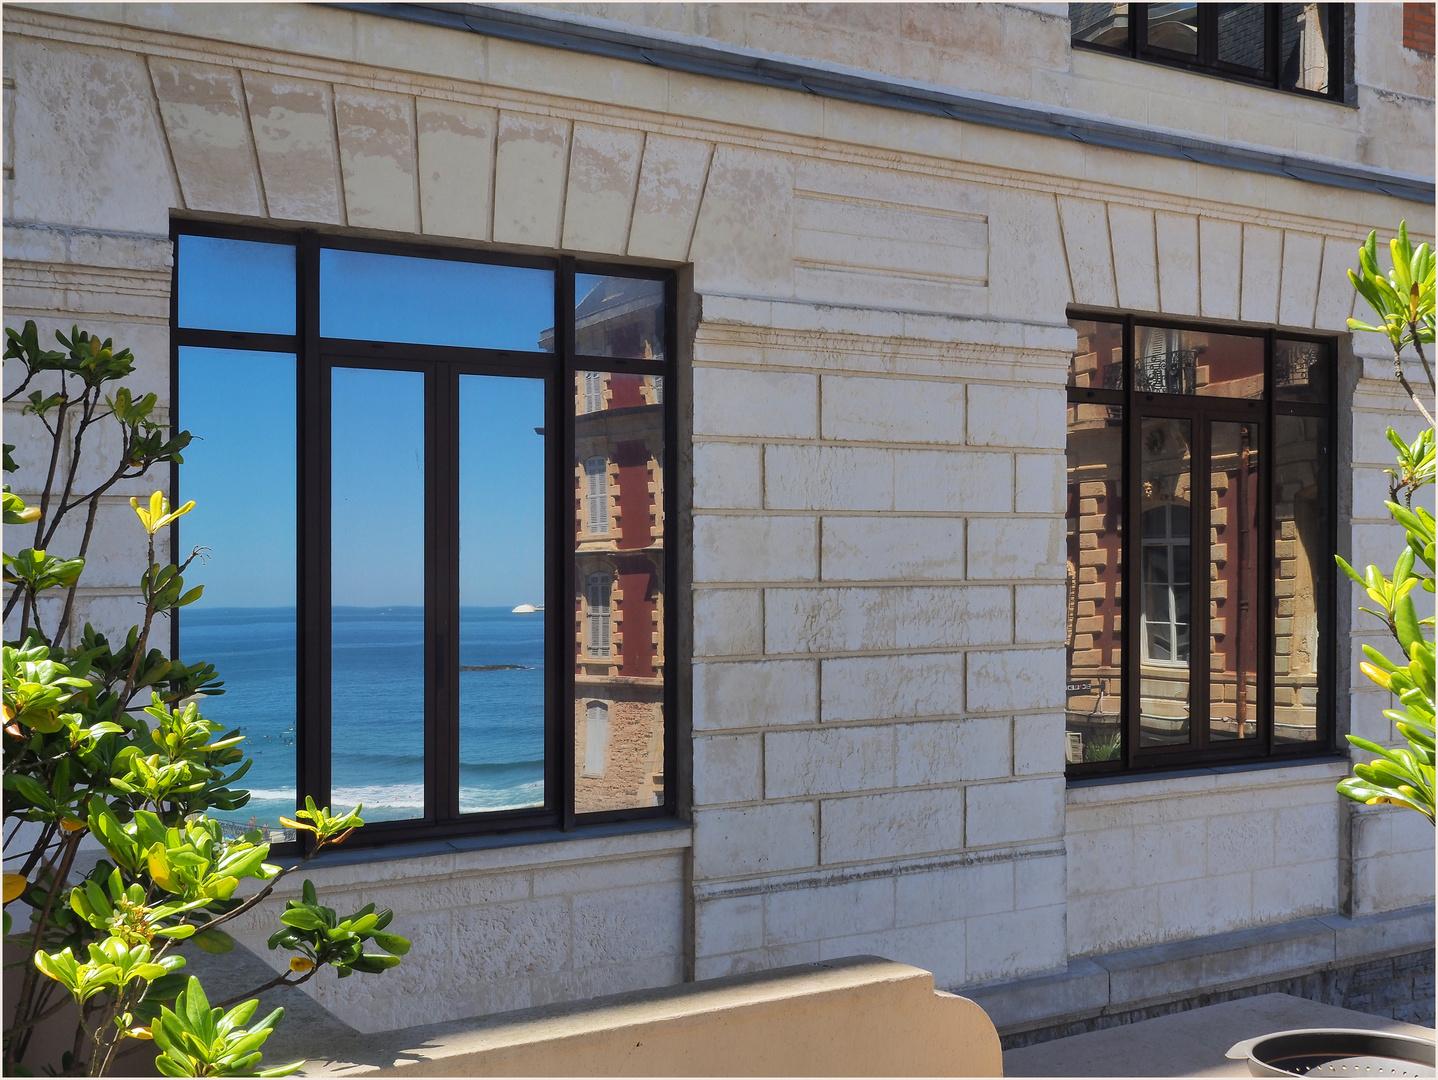 Impression de Biarritz